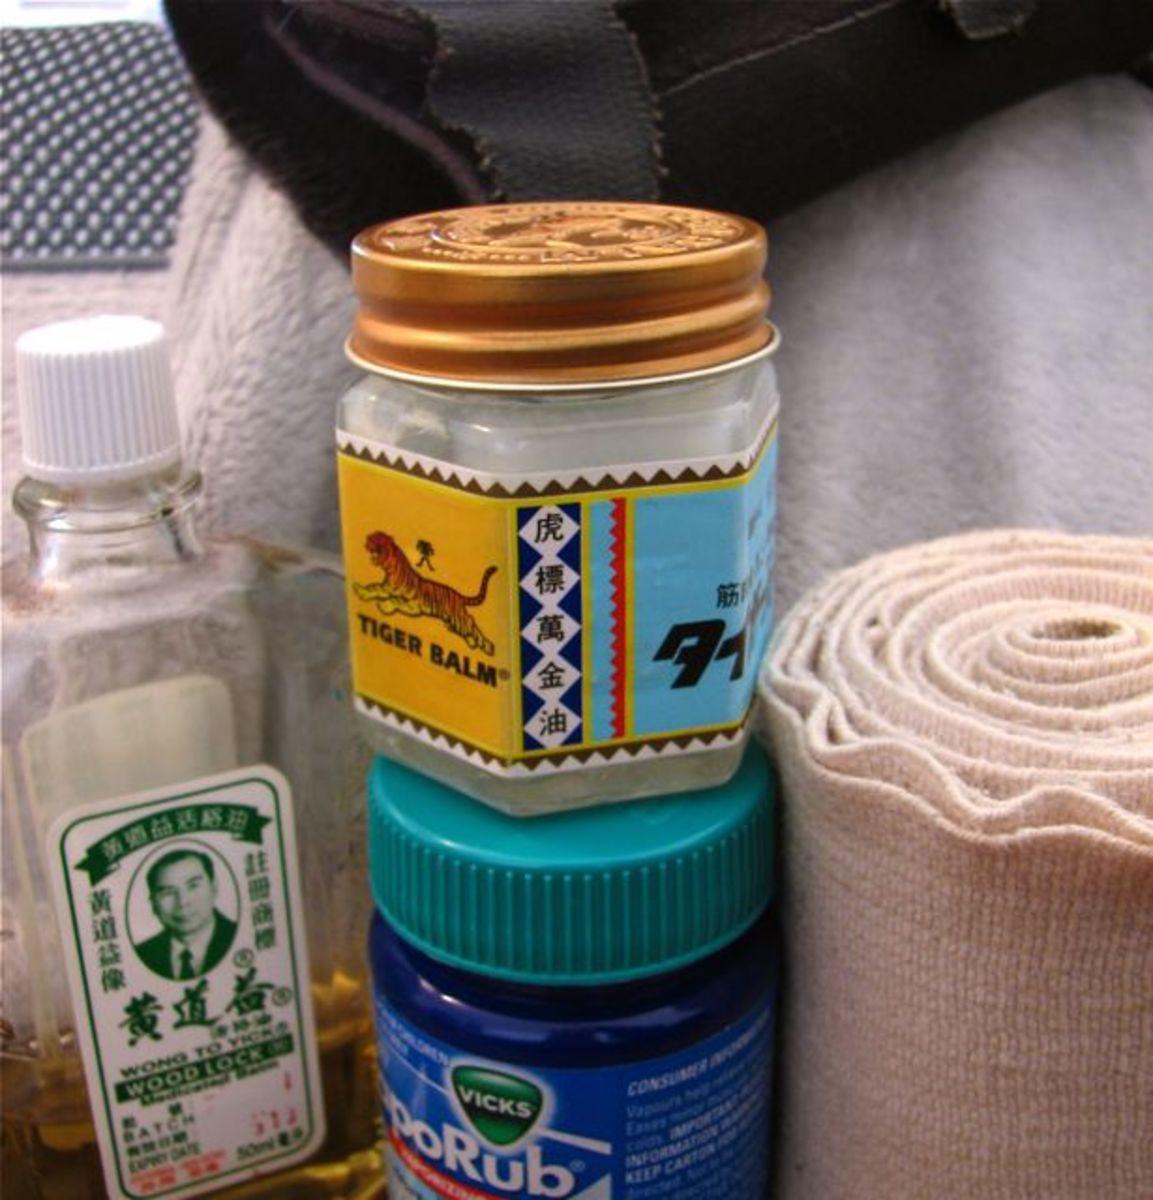 Menthol rubs, bandage, wrist brace and massage cushion.